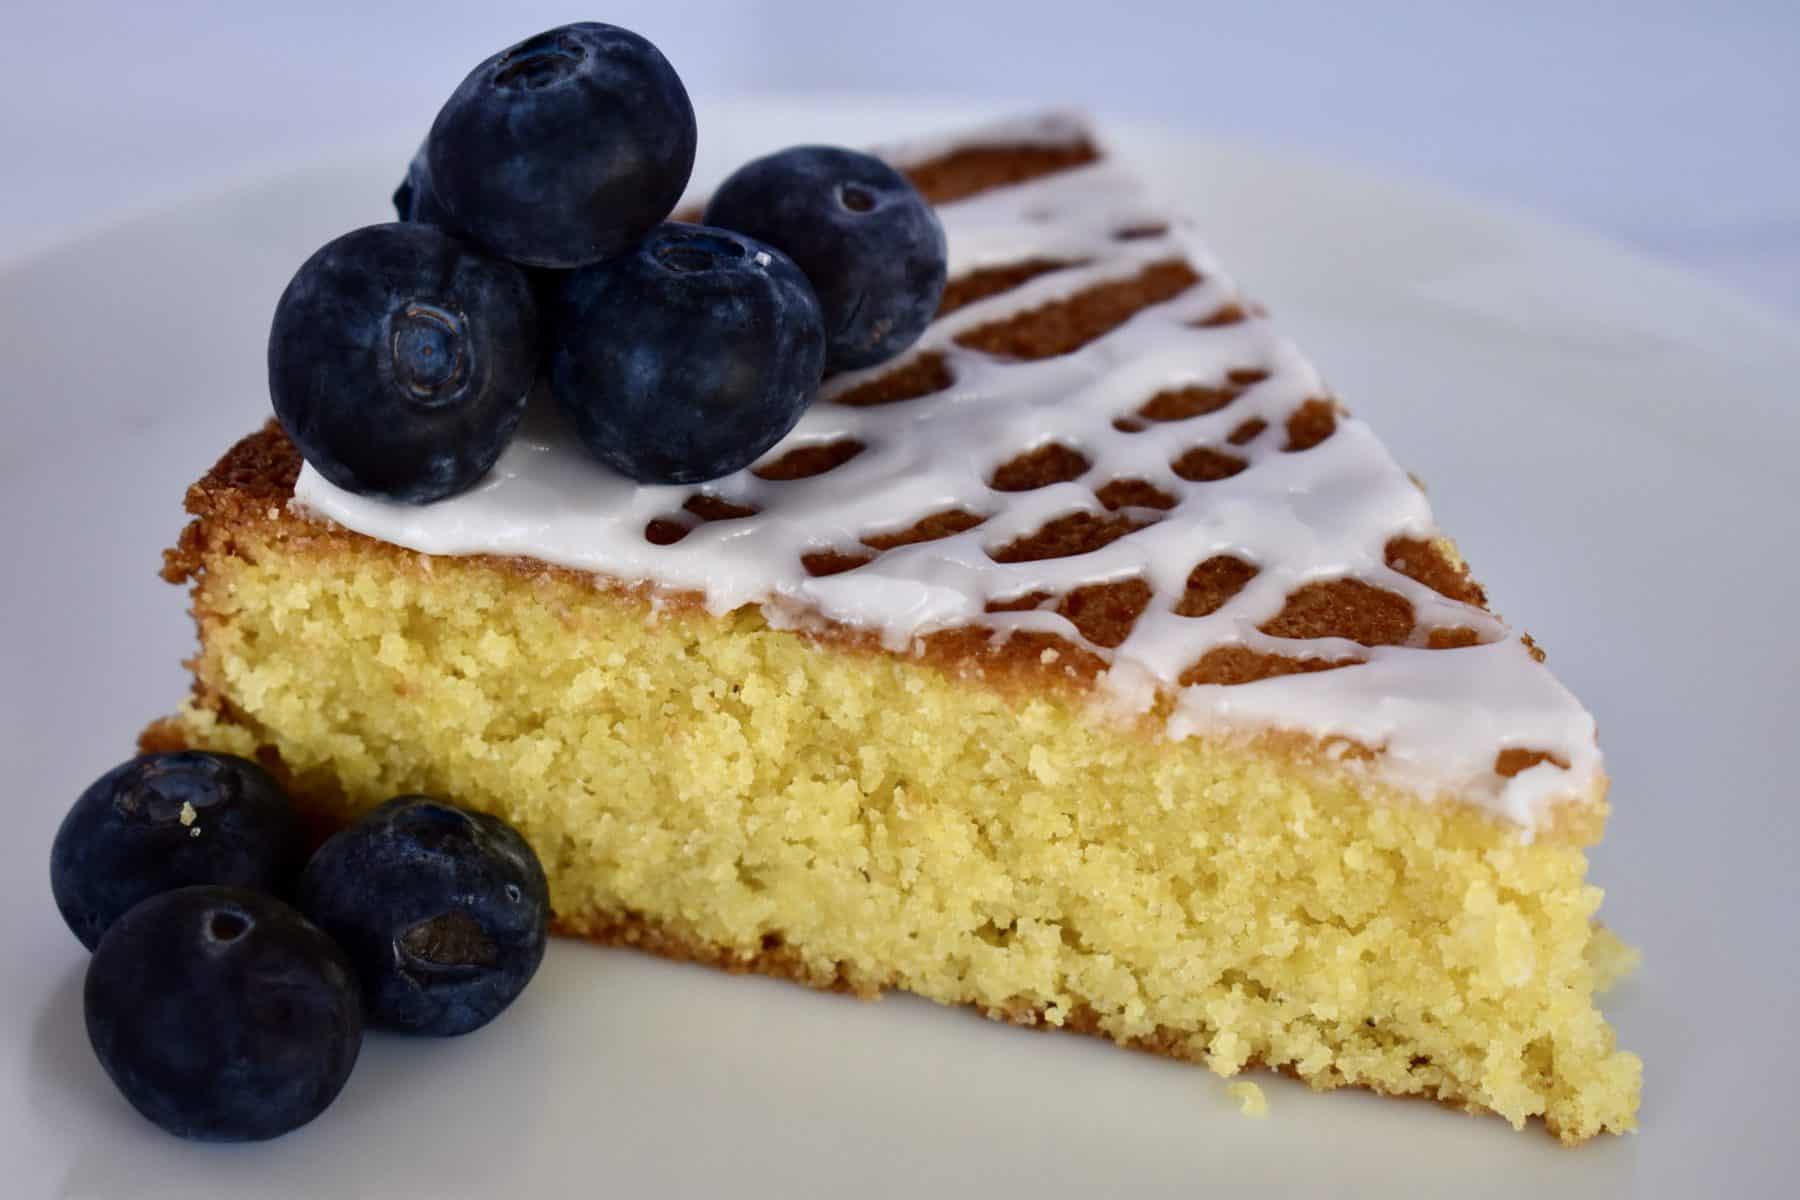 Lemon Polenta Cake on a white plate with blueberries.